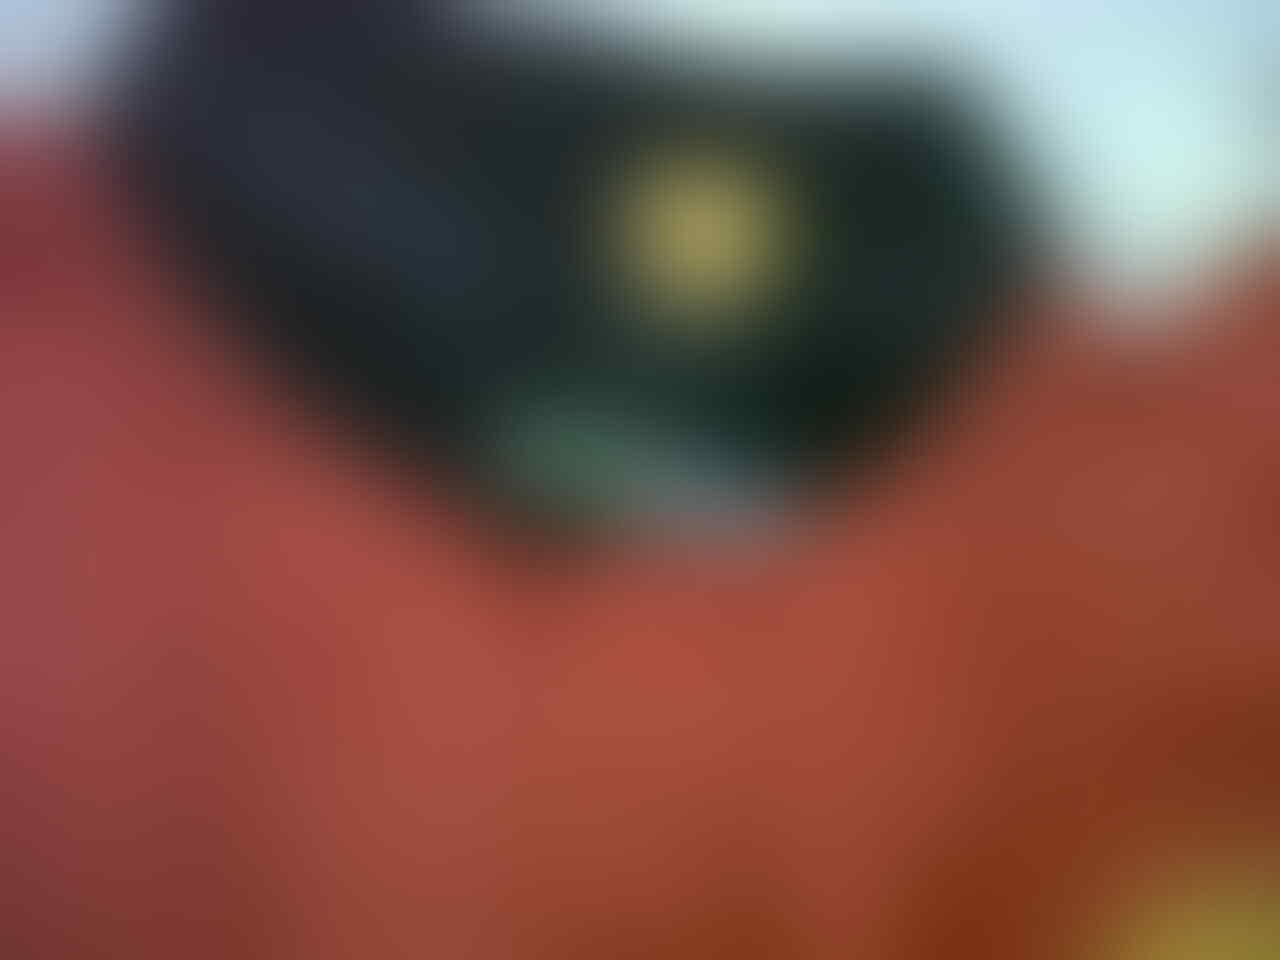 -2NDFLOOR JERSEY- jual jersey musim 13/14 murah berkualitas READY STOCK